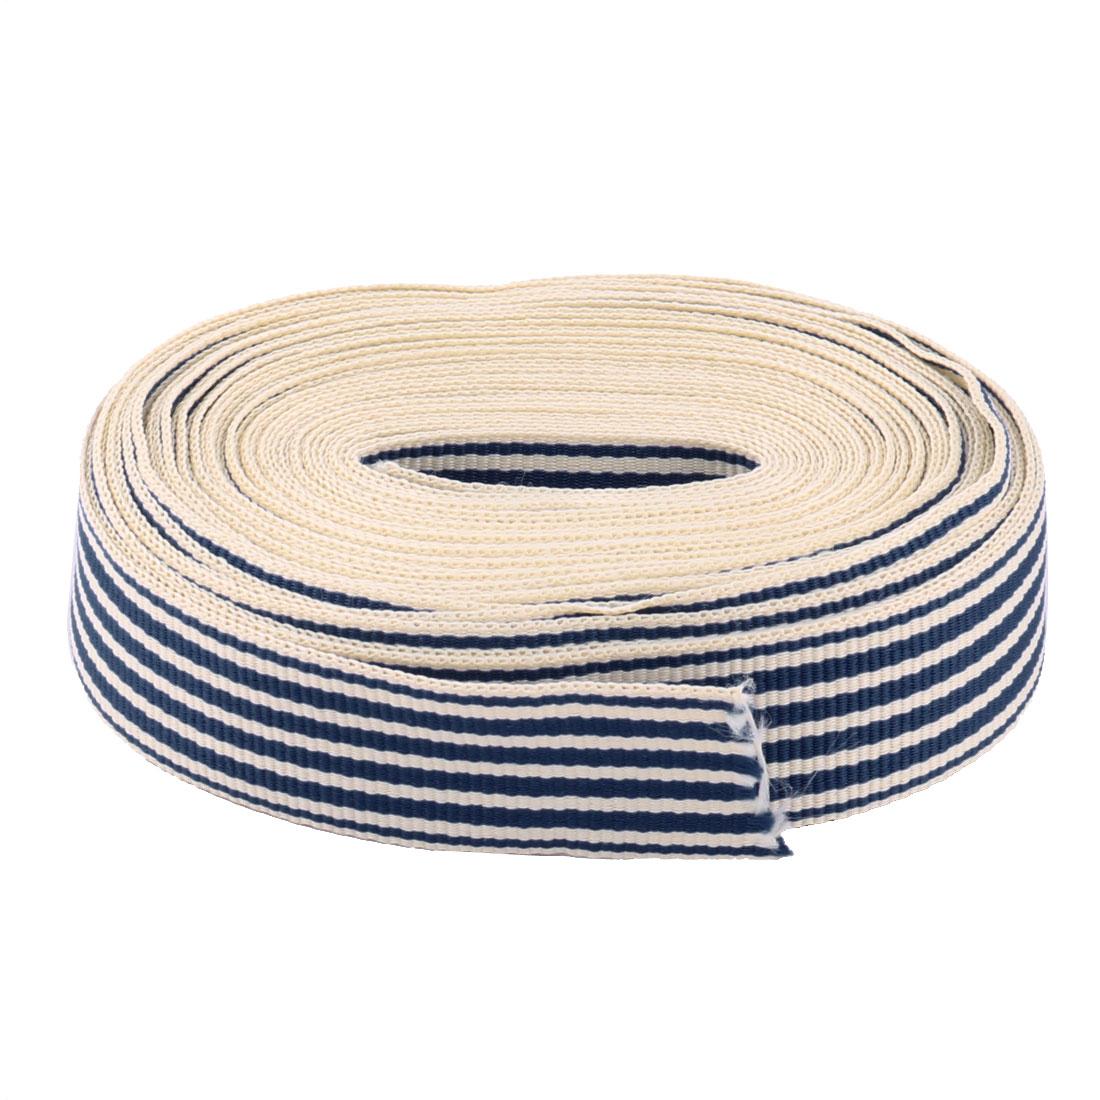 Polyester Stripe Print Birthday Cake Box Decor Wrap Ribbon Navy Blue 10 Yards